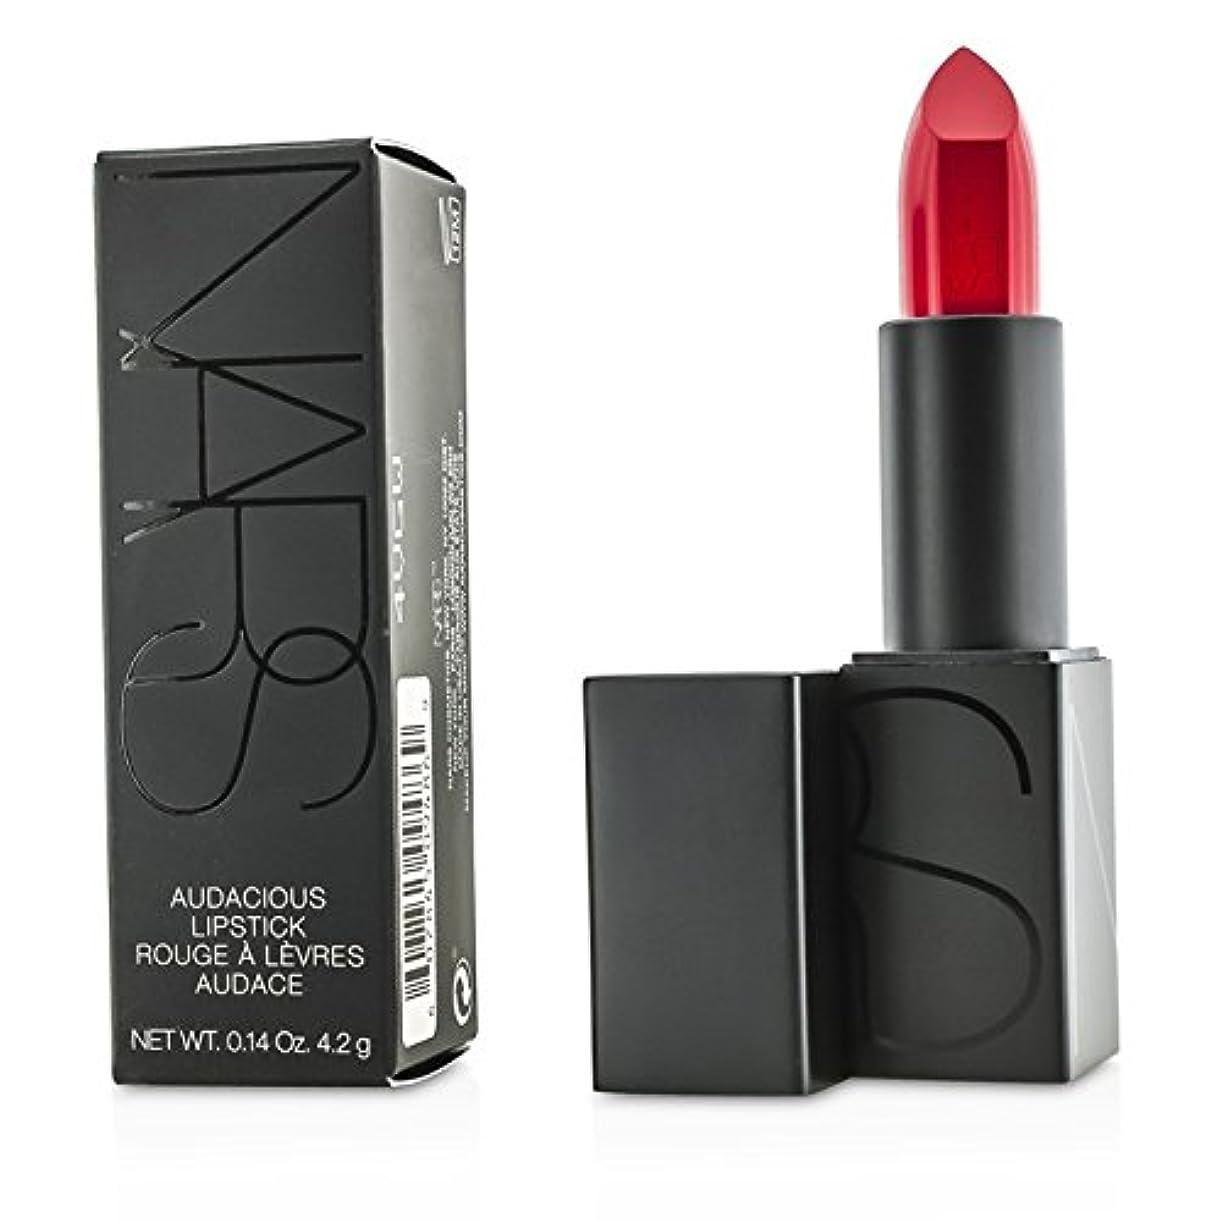 前進好奇心同様のナーズ Audacious Lipstick - Kelly 4.2g/0.14oz並行輸入品